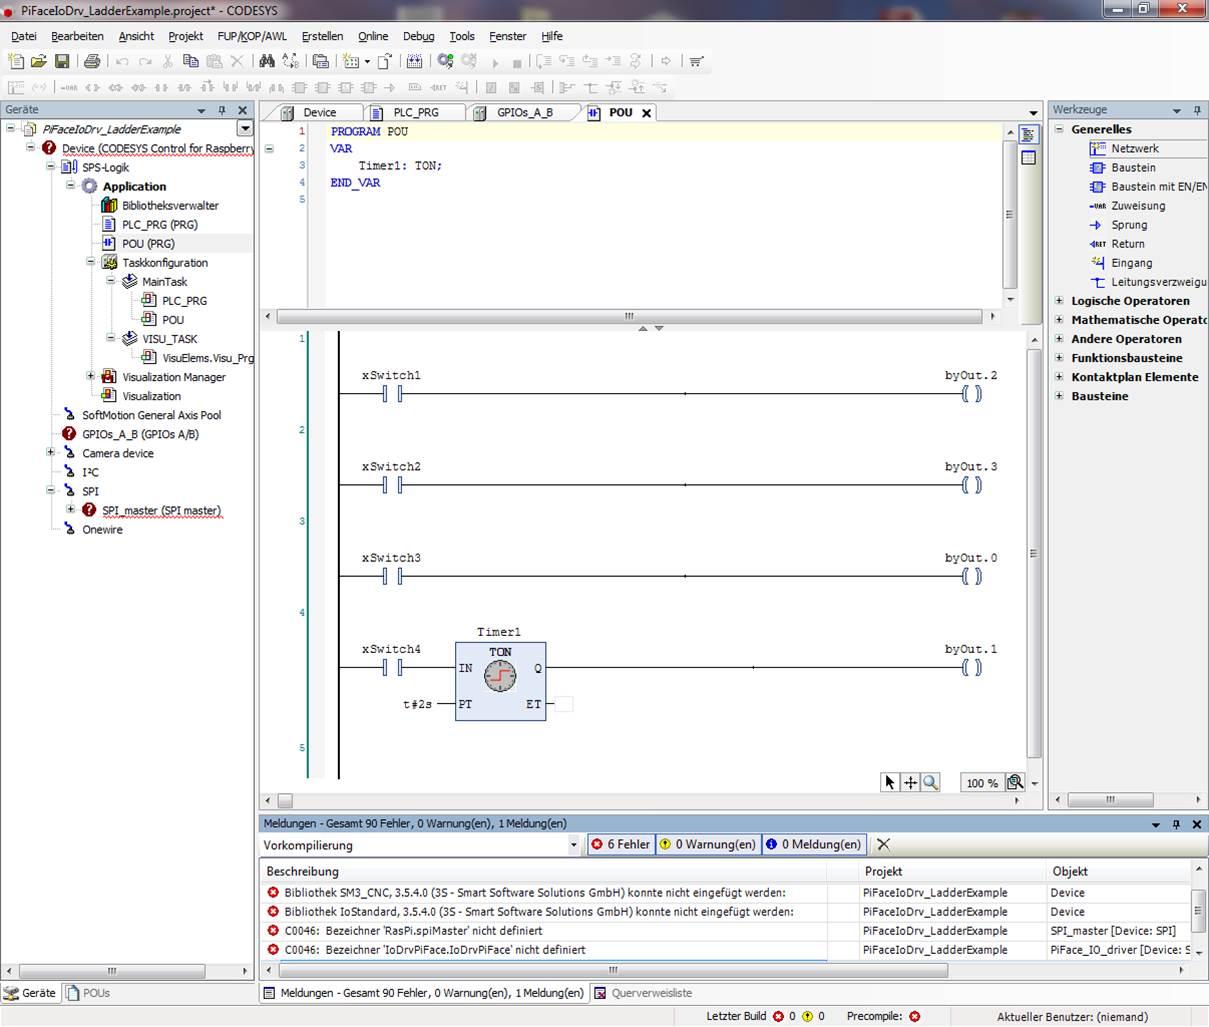 IMG: PiFaceIoDrv_LadderExample Probleme 03.jpg